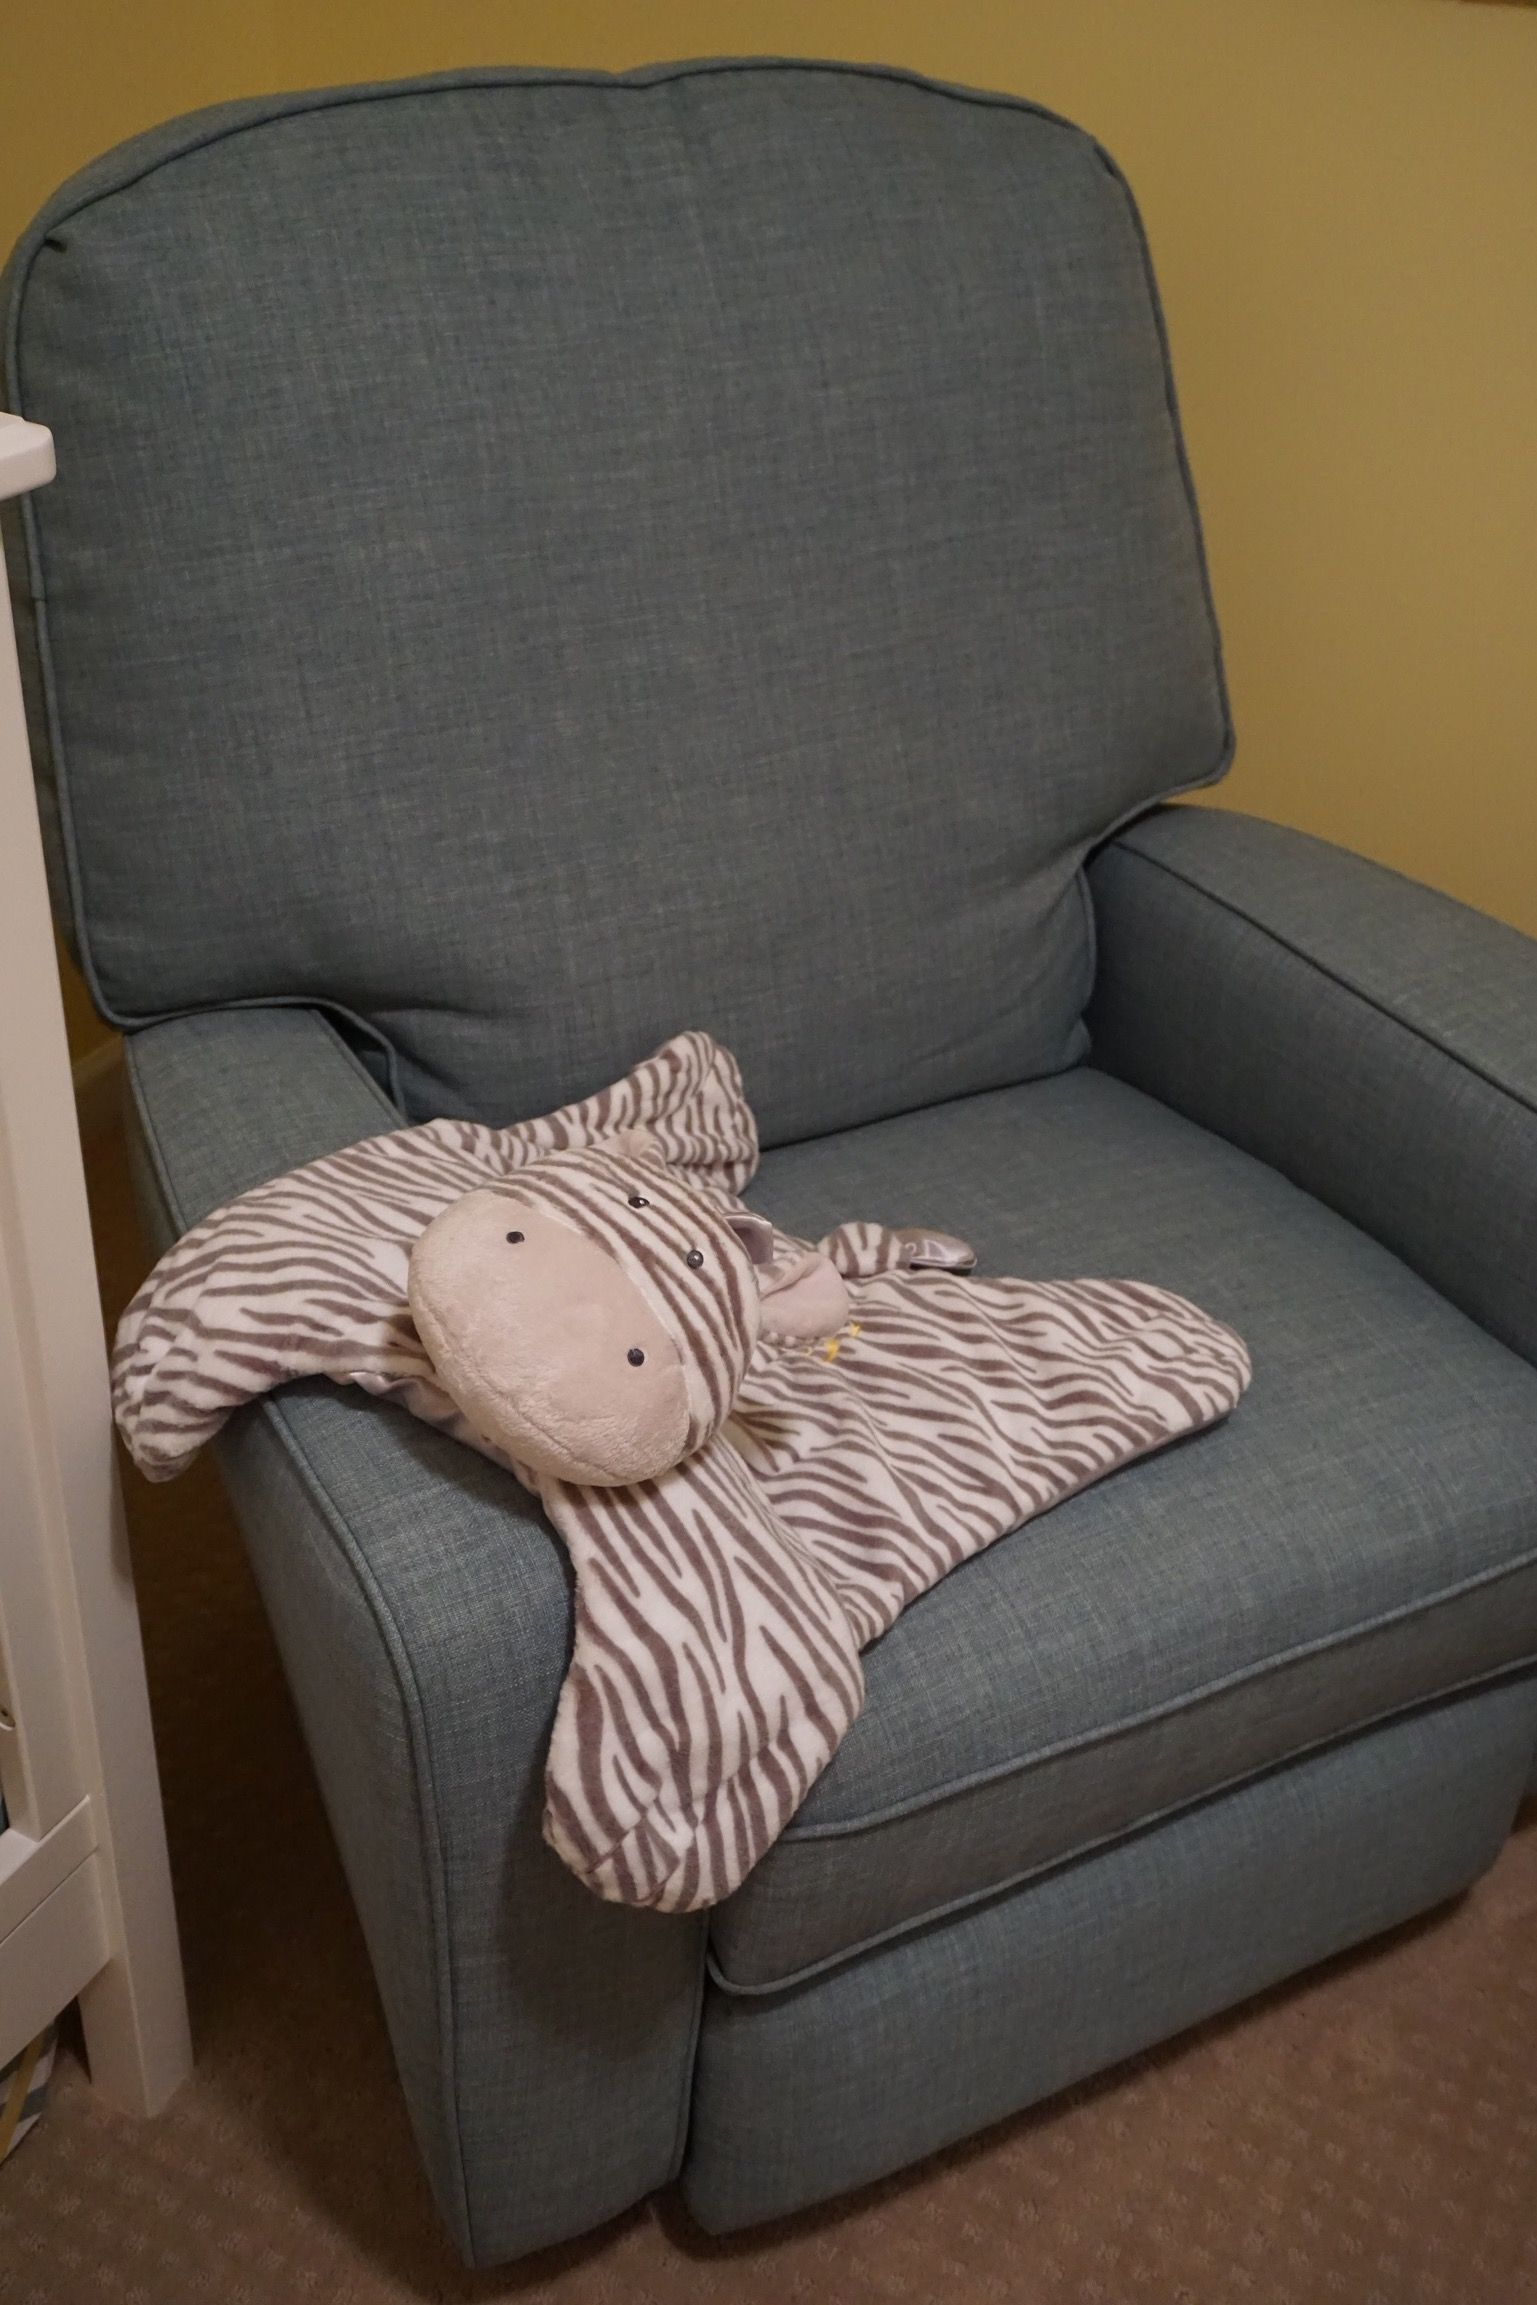 besthf com chairs posture improving chair pin by melanie pezall on sullivan s nursery pinterest bilana swivel recliner best storytime series http www